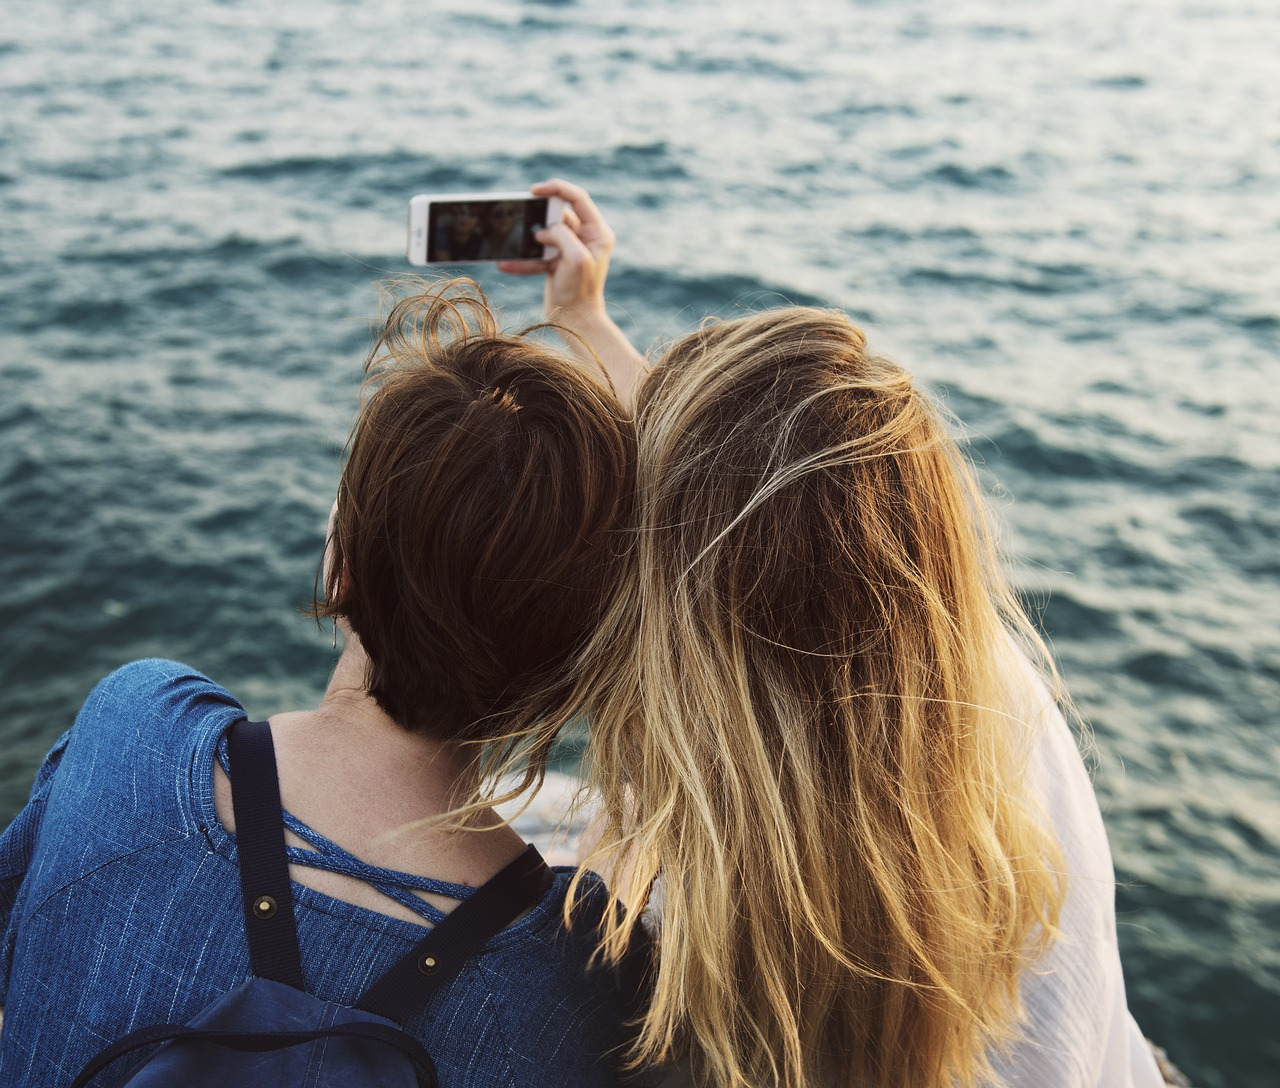 Hashtag per ottenere like su Instagram selfie